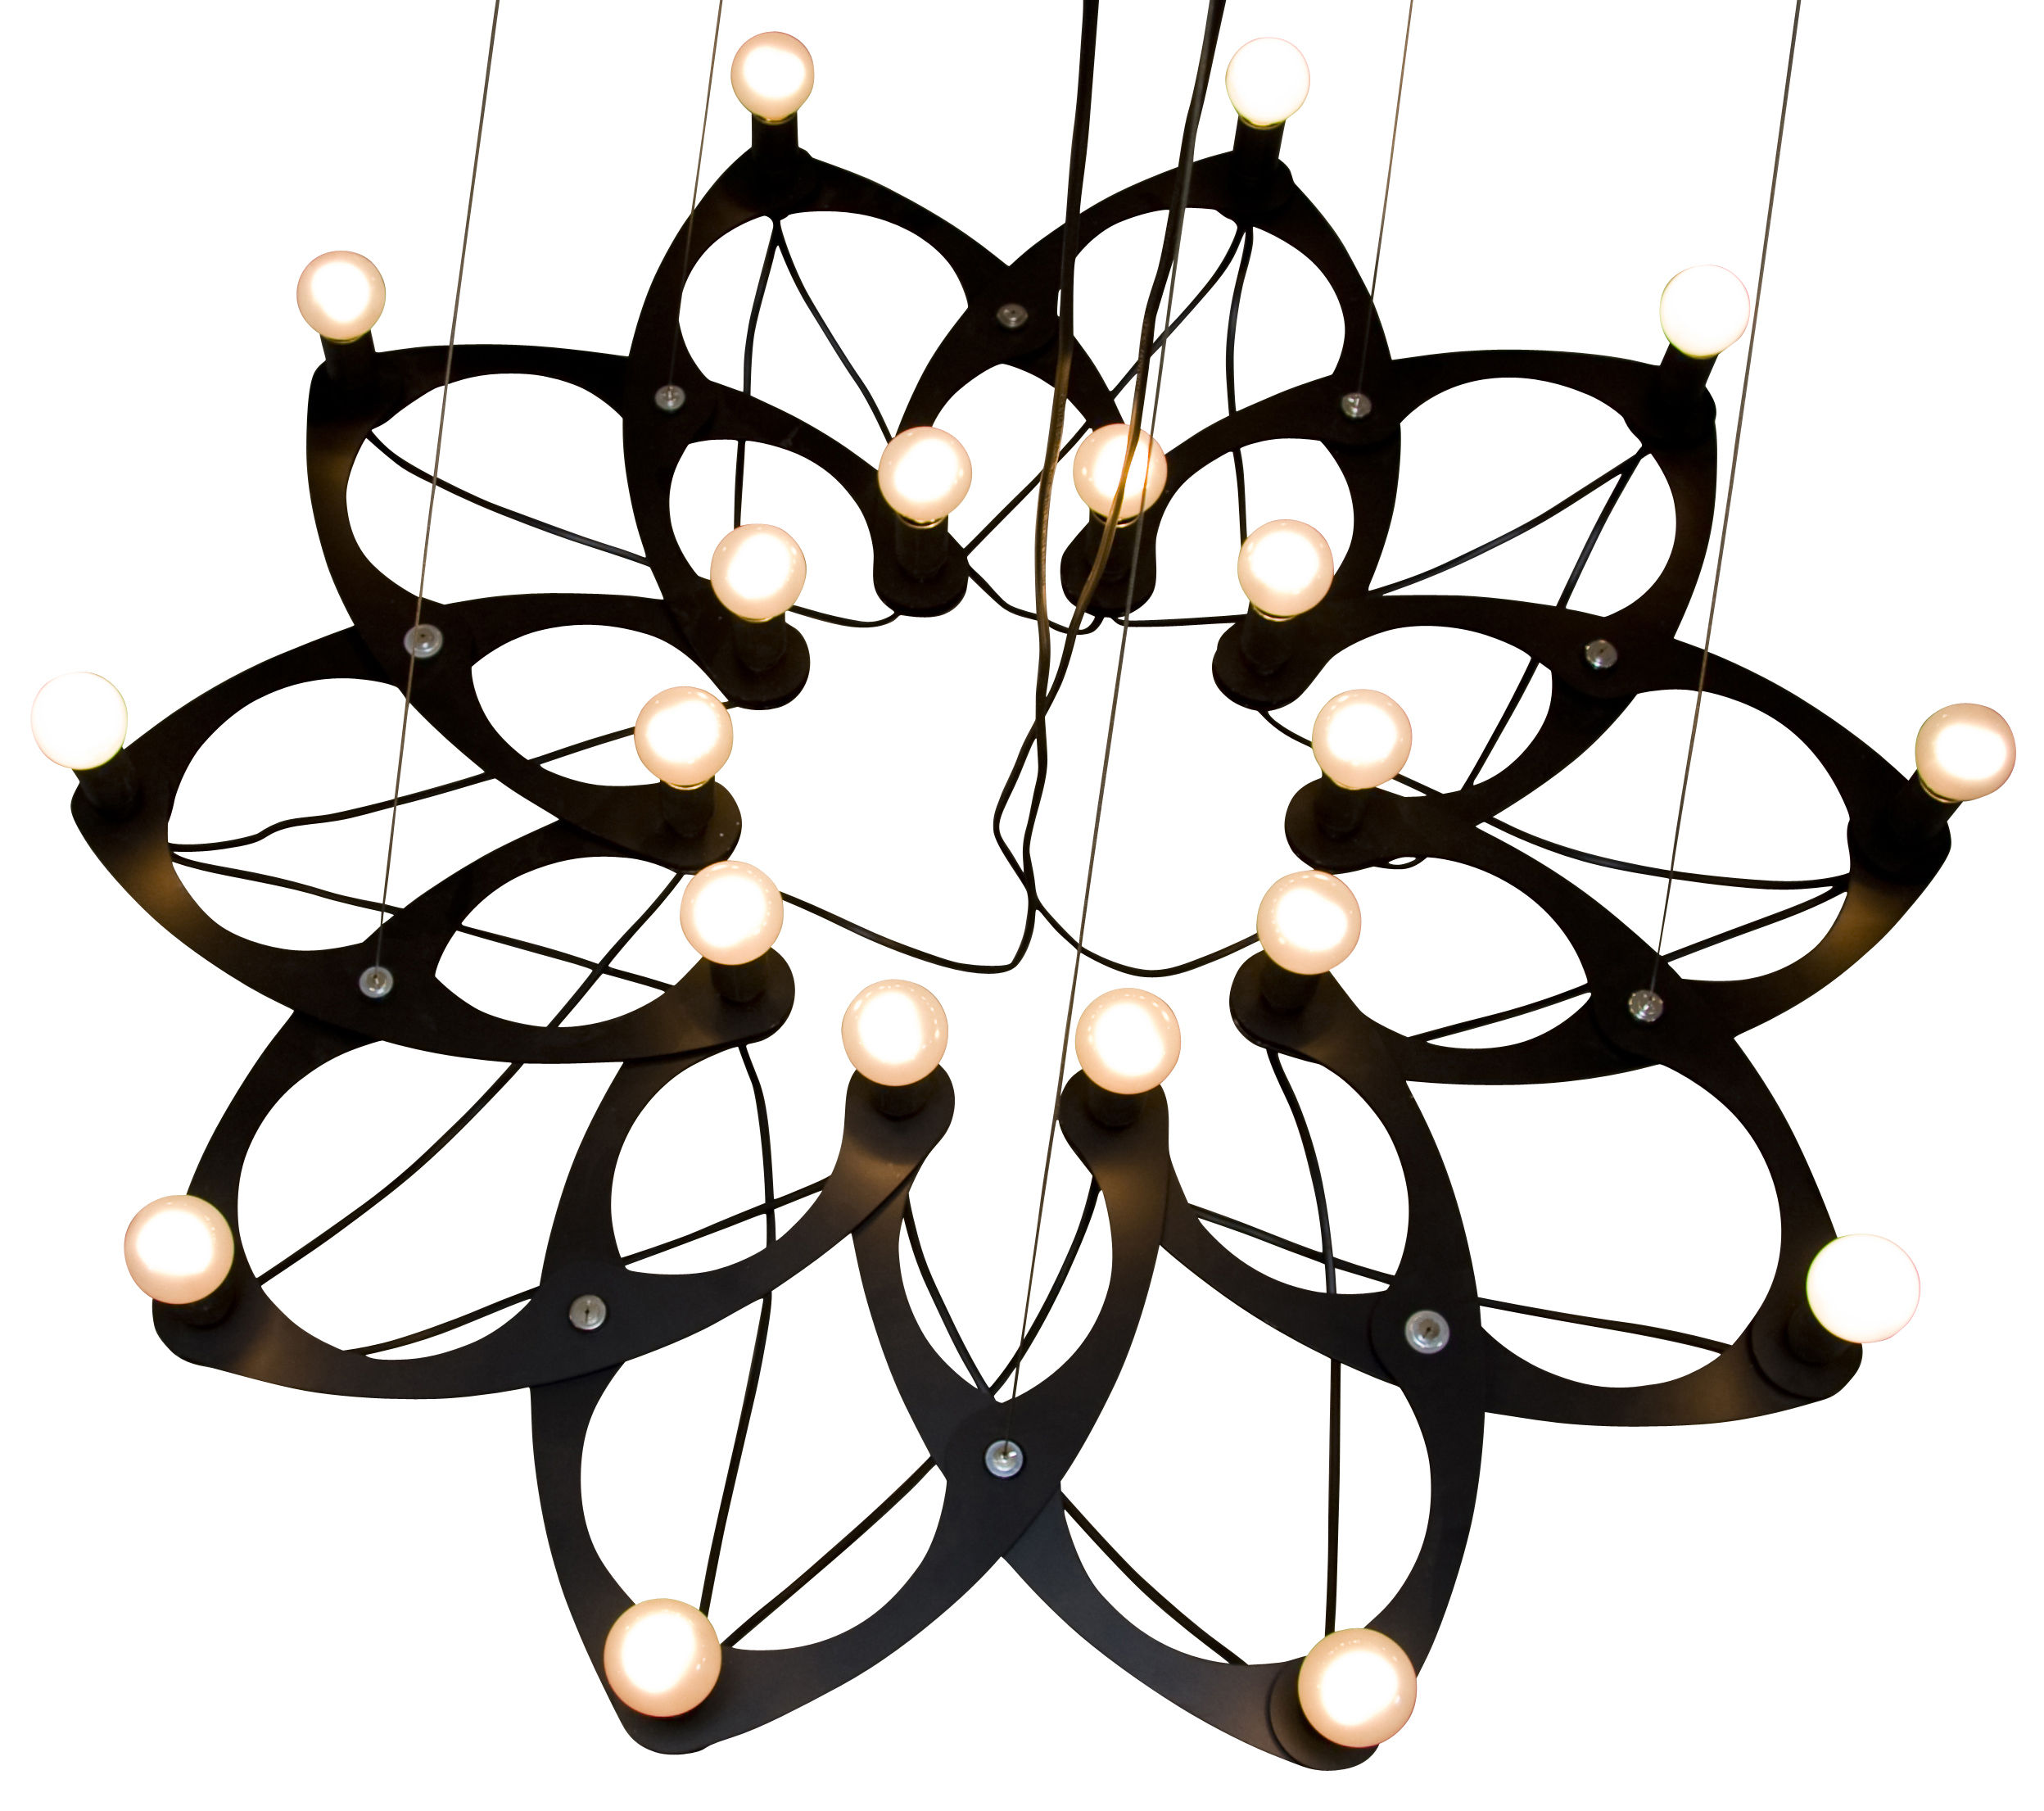 Lighting - Pendant Lighting - Ornametrica Pendant - Modular by Bloom! - Black - Lacquered aluminium